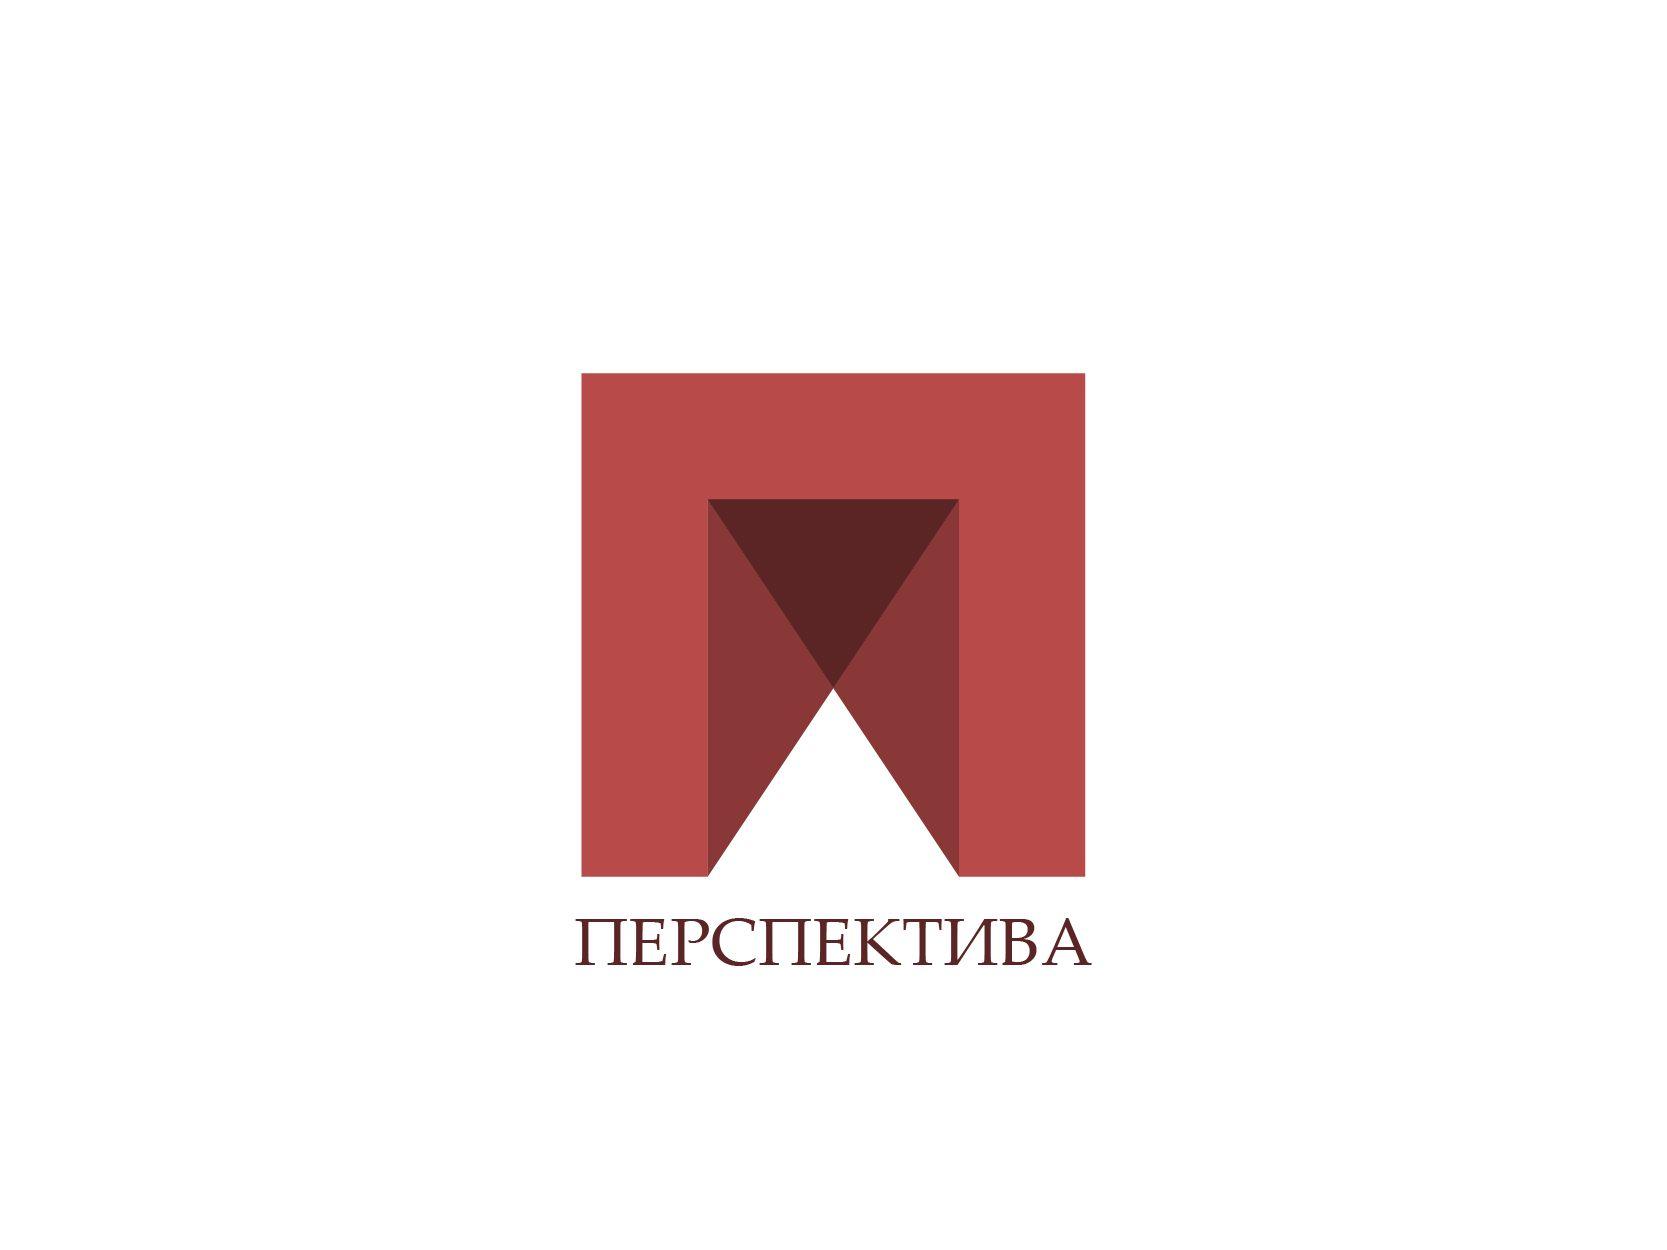 Логотип для компании  - дизайнер airanon